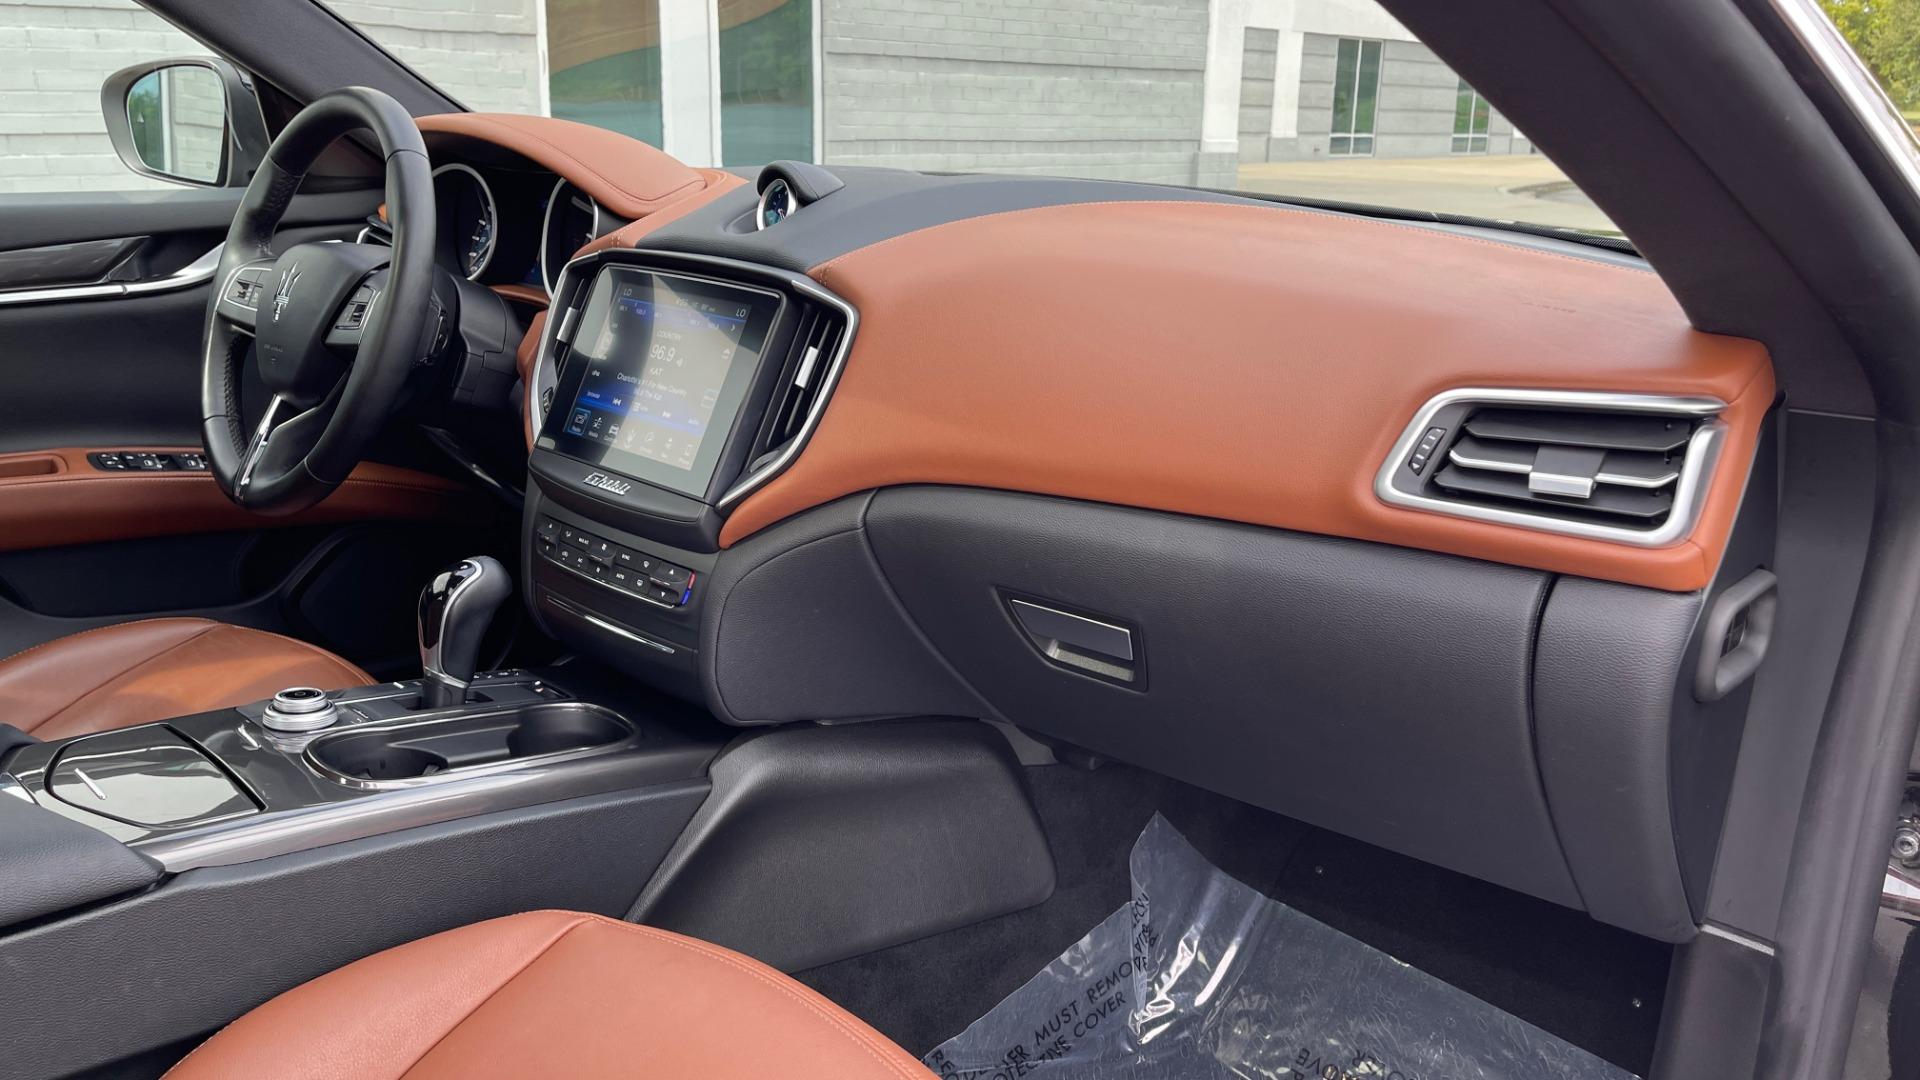 Used 2018 Maserati GHIBLI 3.0L SEDAN / 8-SPD AUTO / NAV / SUNROOF / REARVIEW for sale $42,995 at Formula Imports in Charlotte NC 28227 59